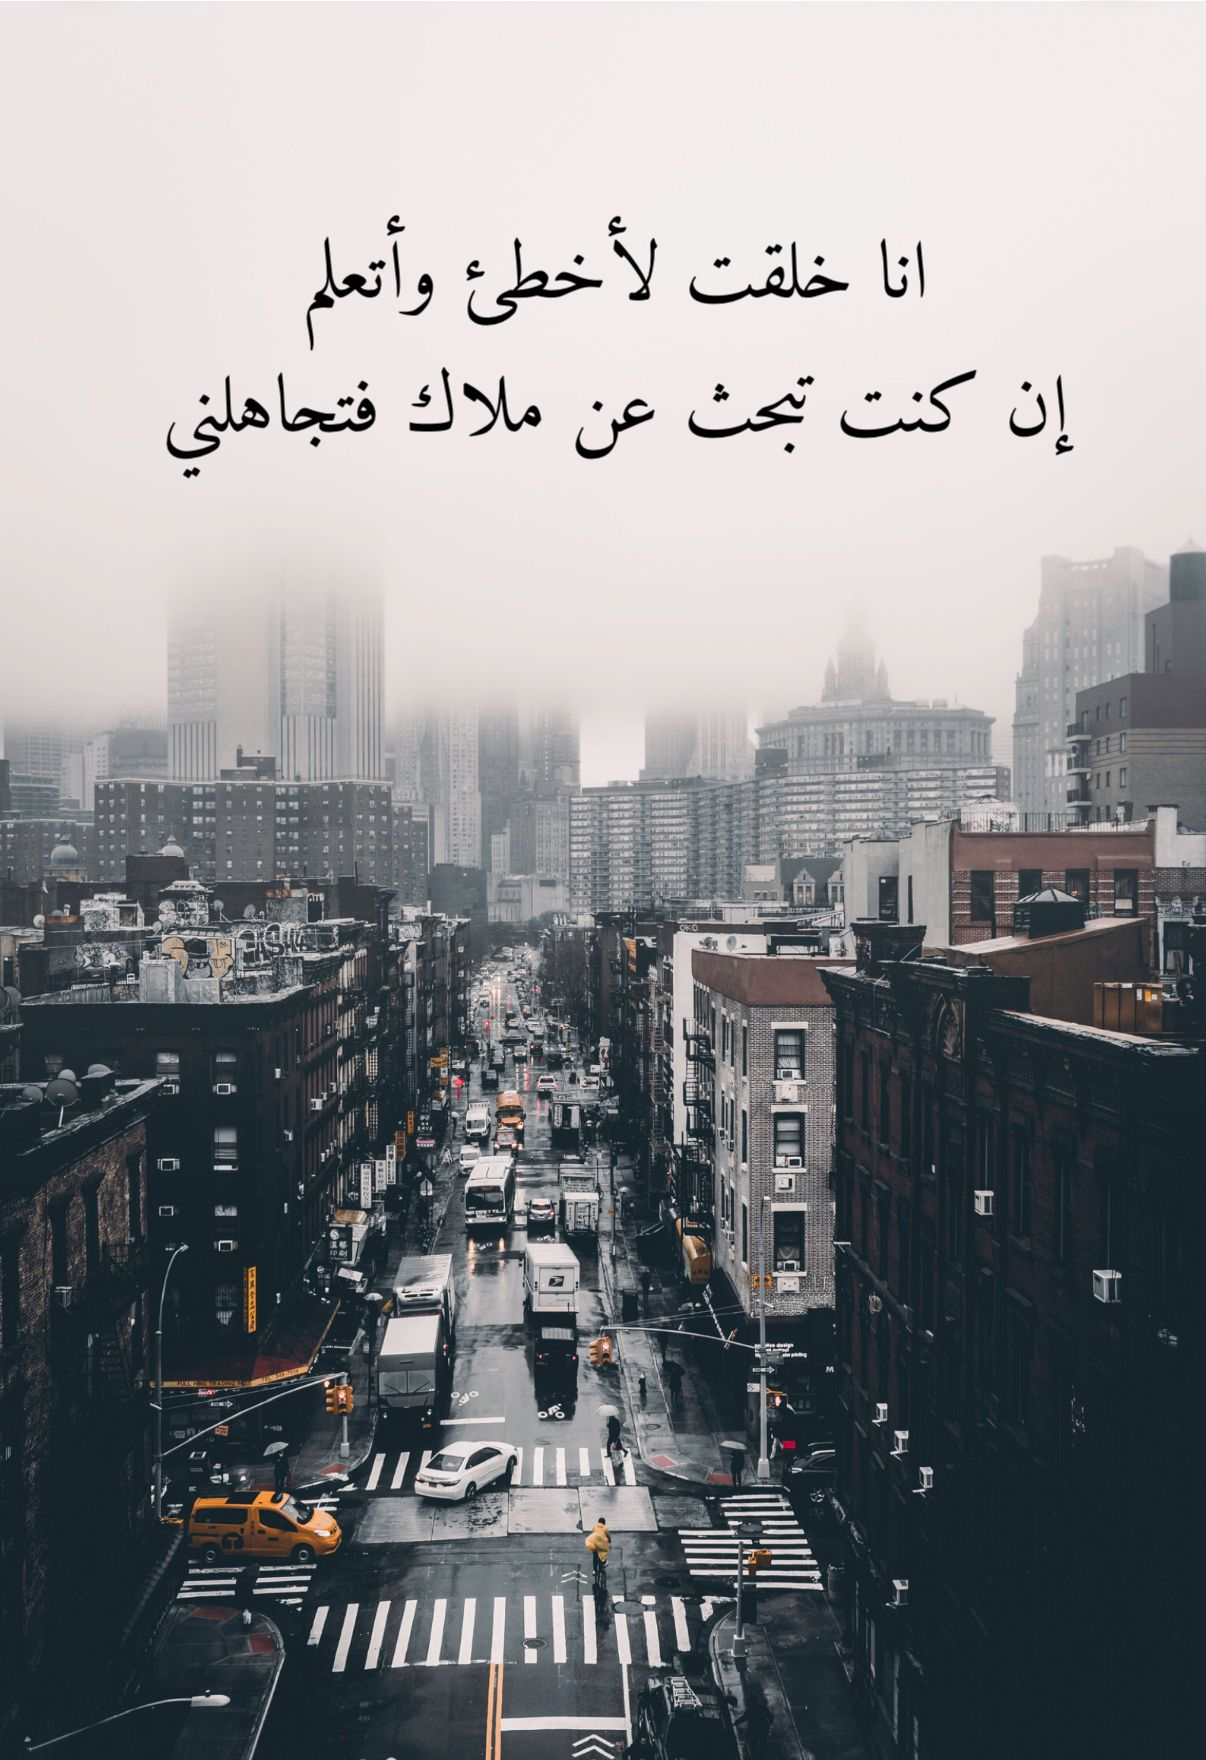 Pin By Fahad Baloch On Arabic Quotes Arabic Jokes Arabic Quotes Qoutes